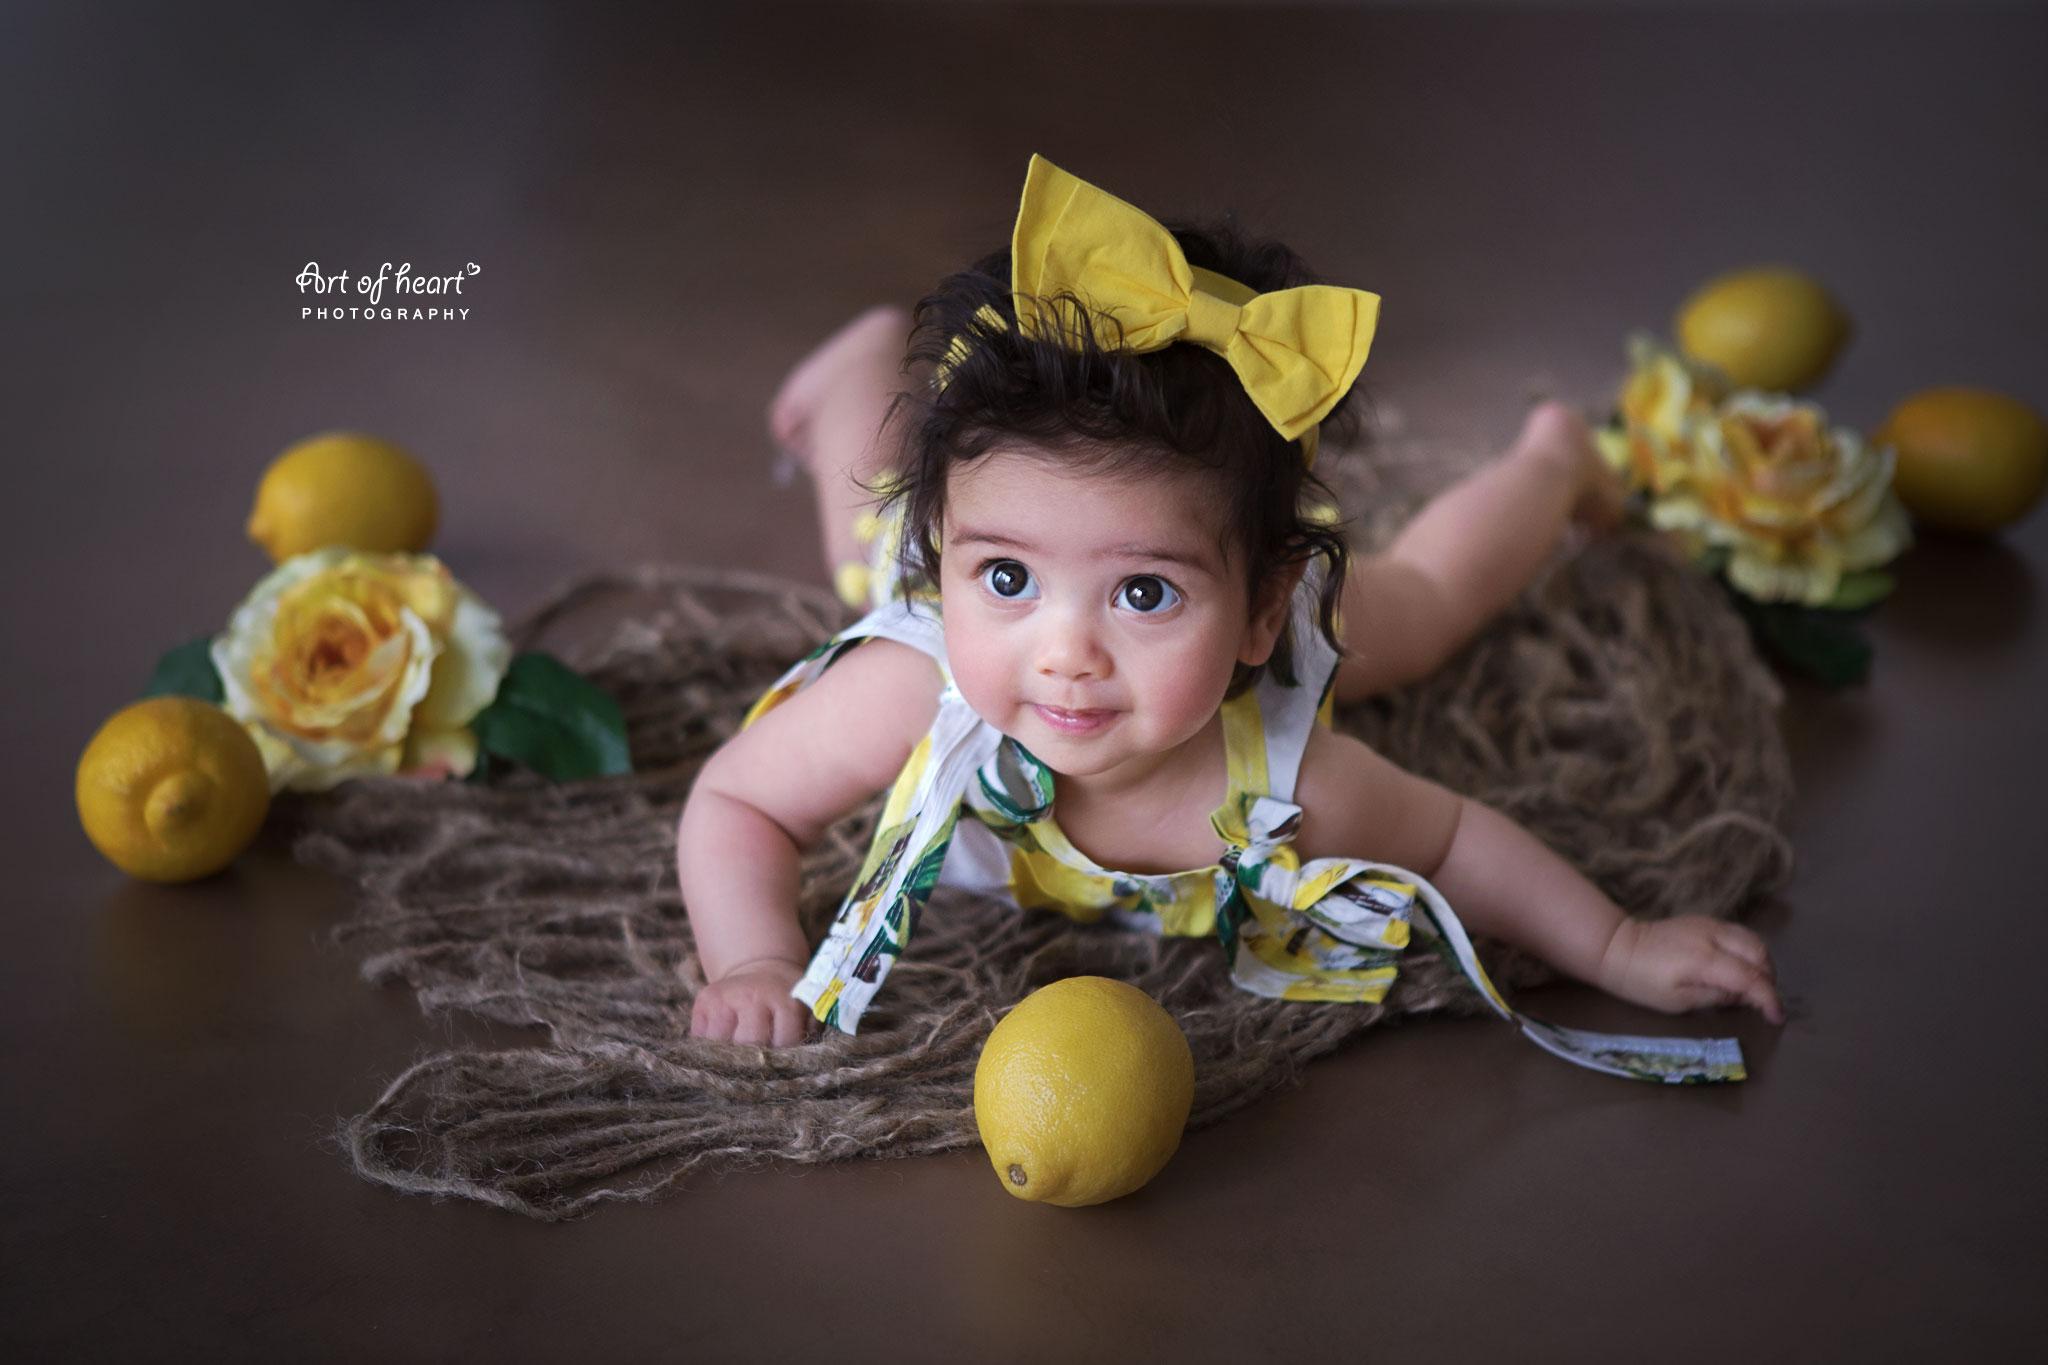 Milestone - Art of Heart Photography